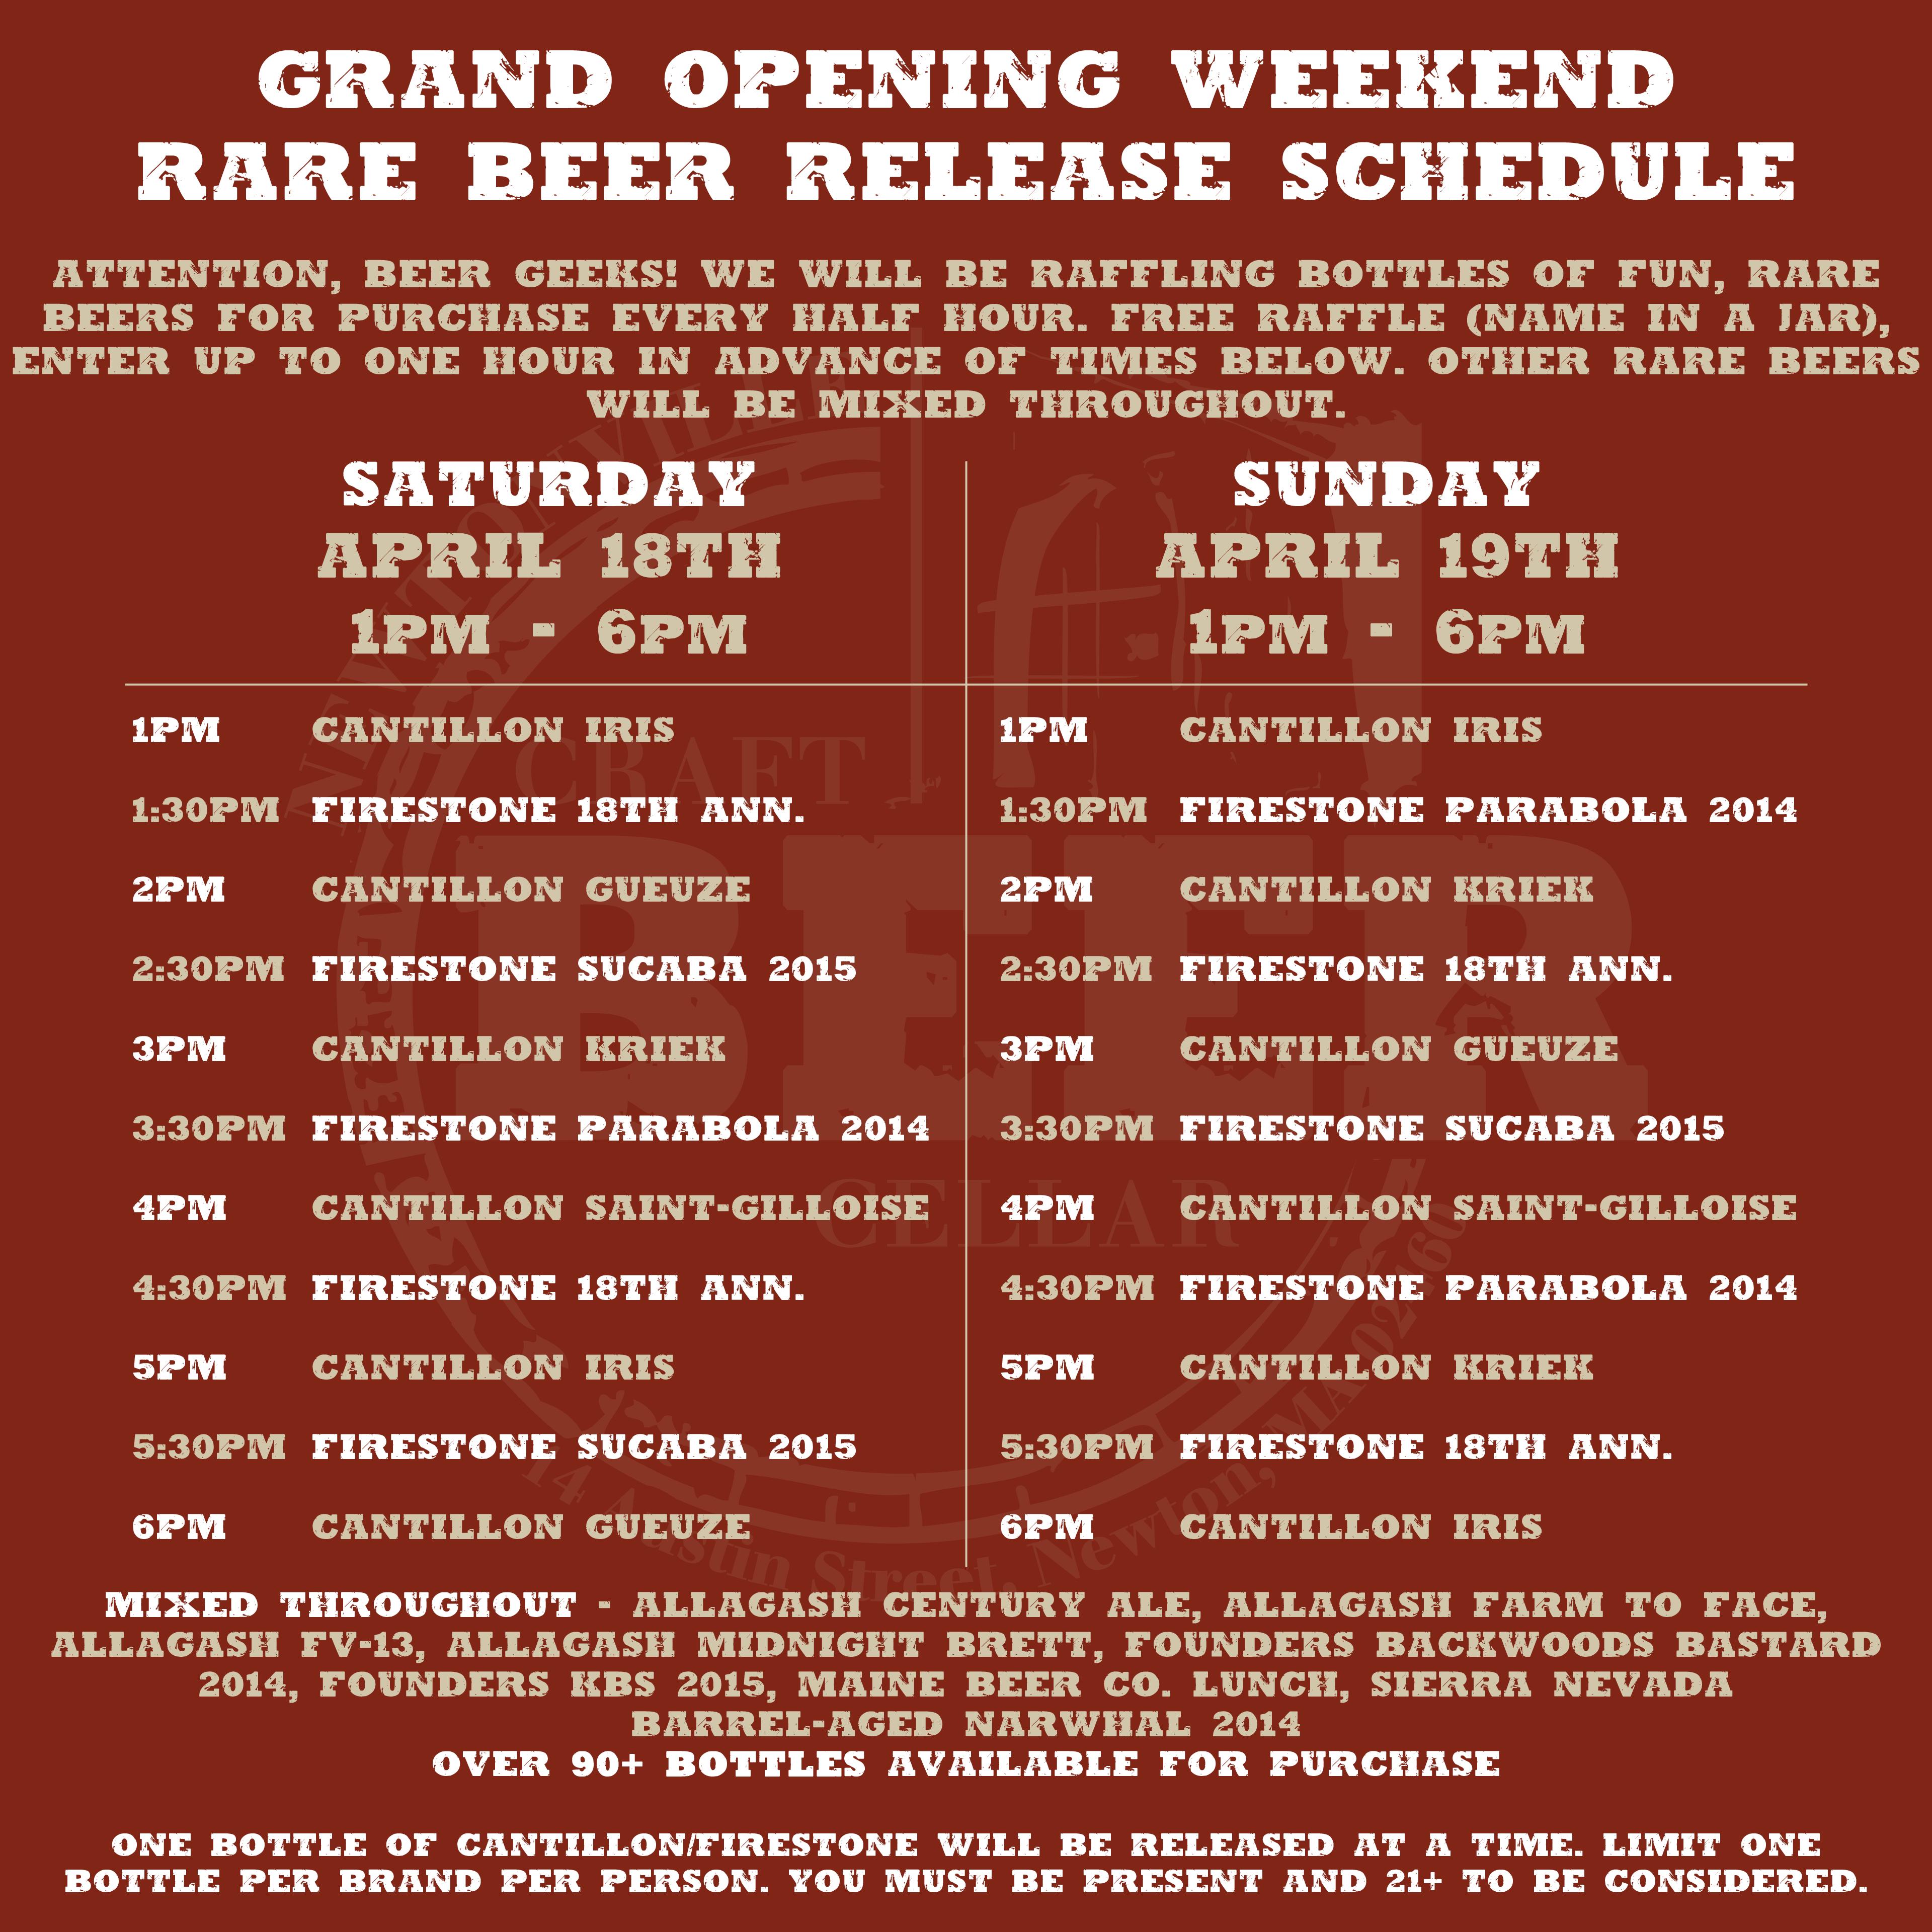 Grand Opening Schedule